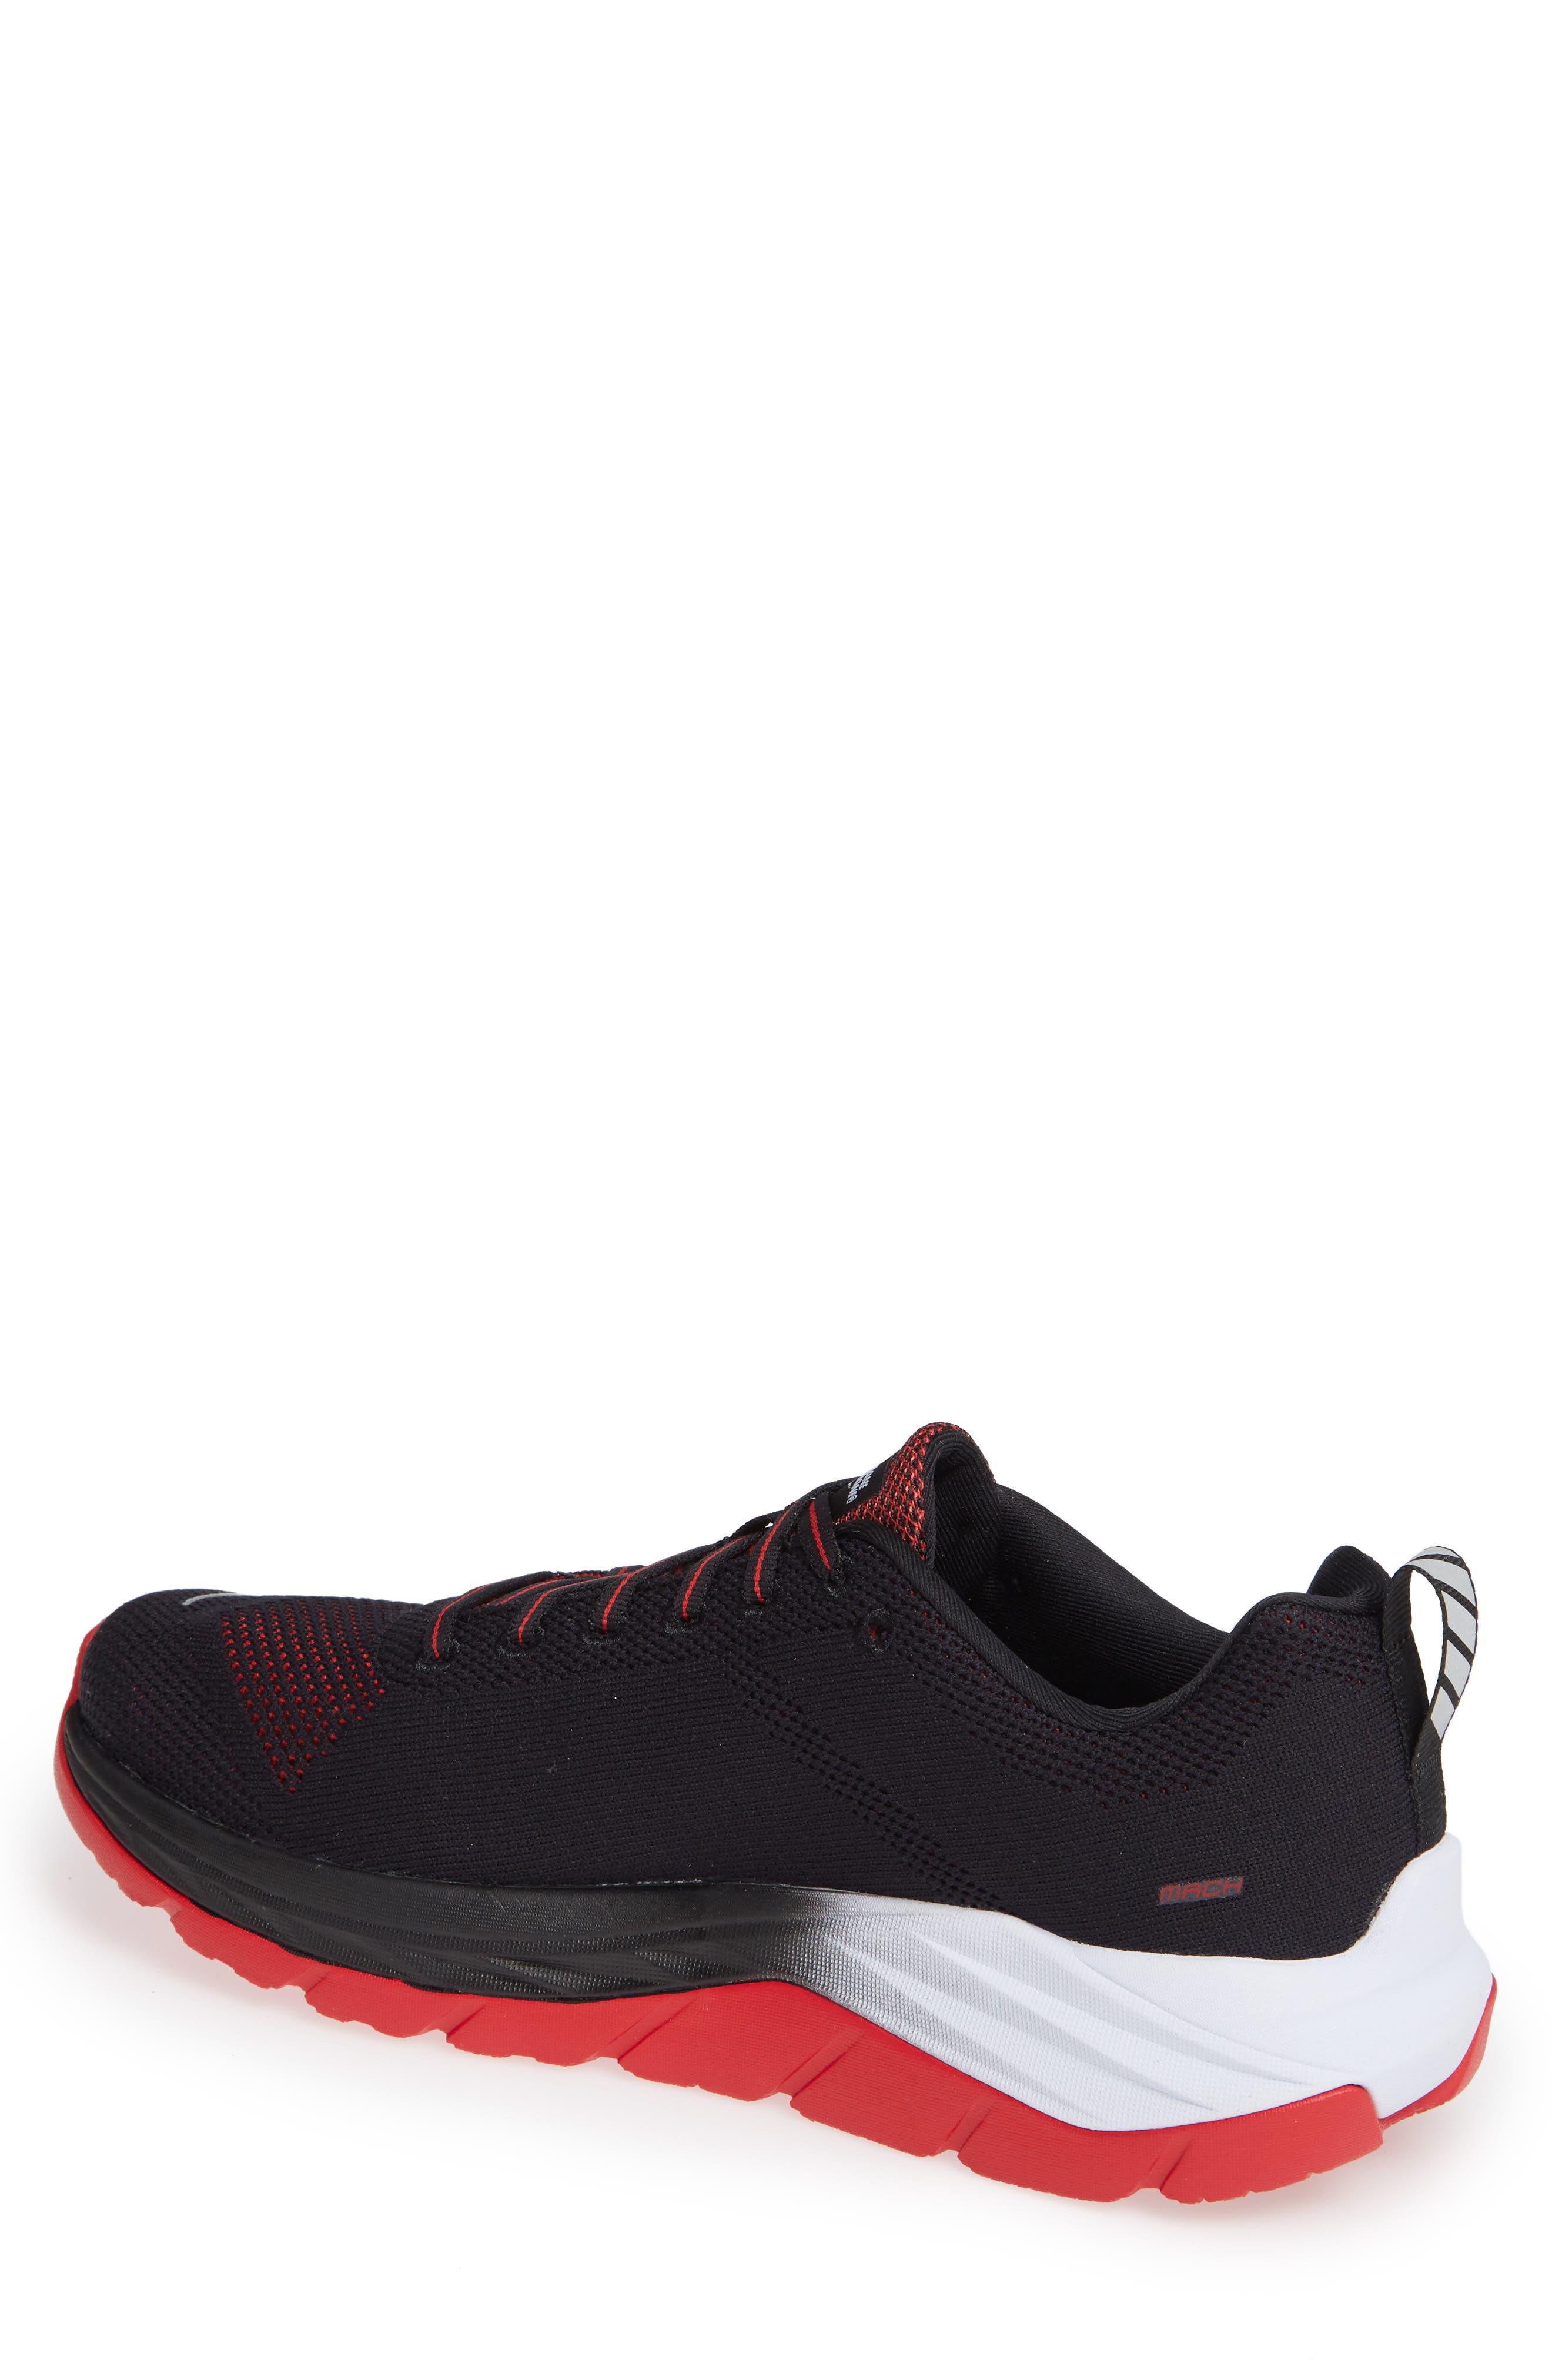 Mach Running Shoe,                             Alternate thumbnail 2, color,                             007